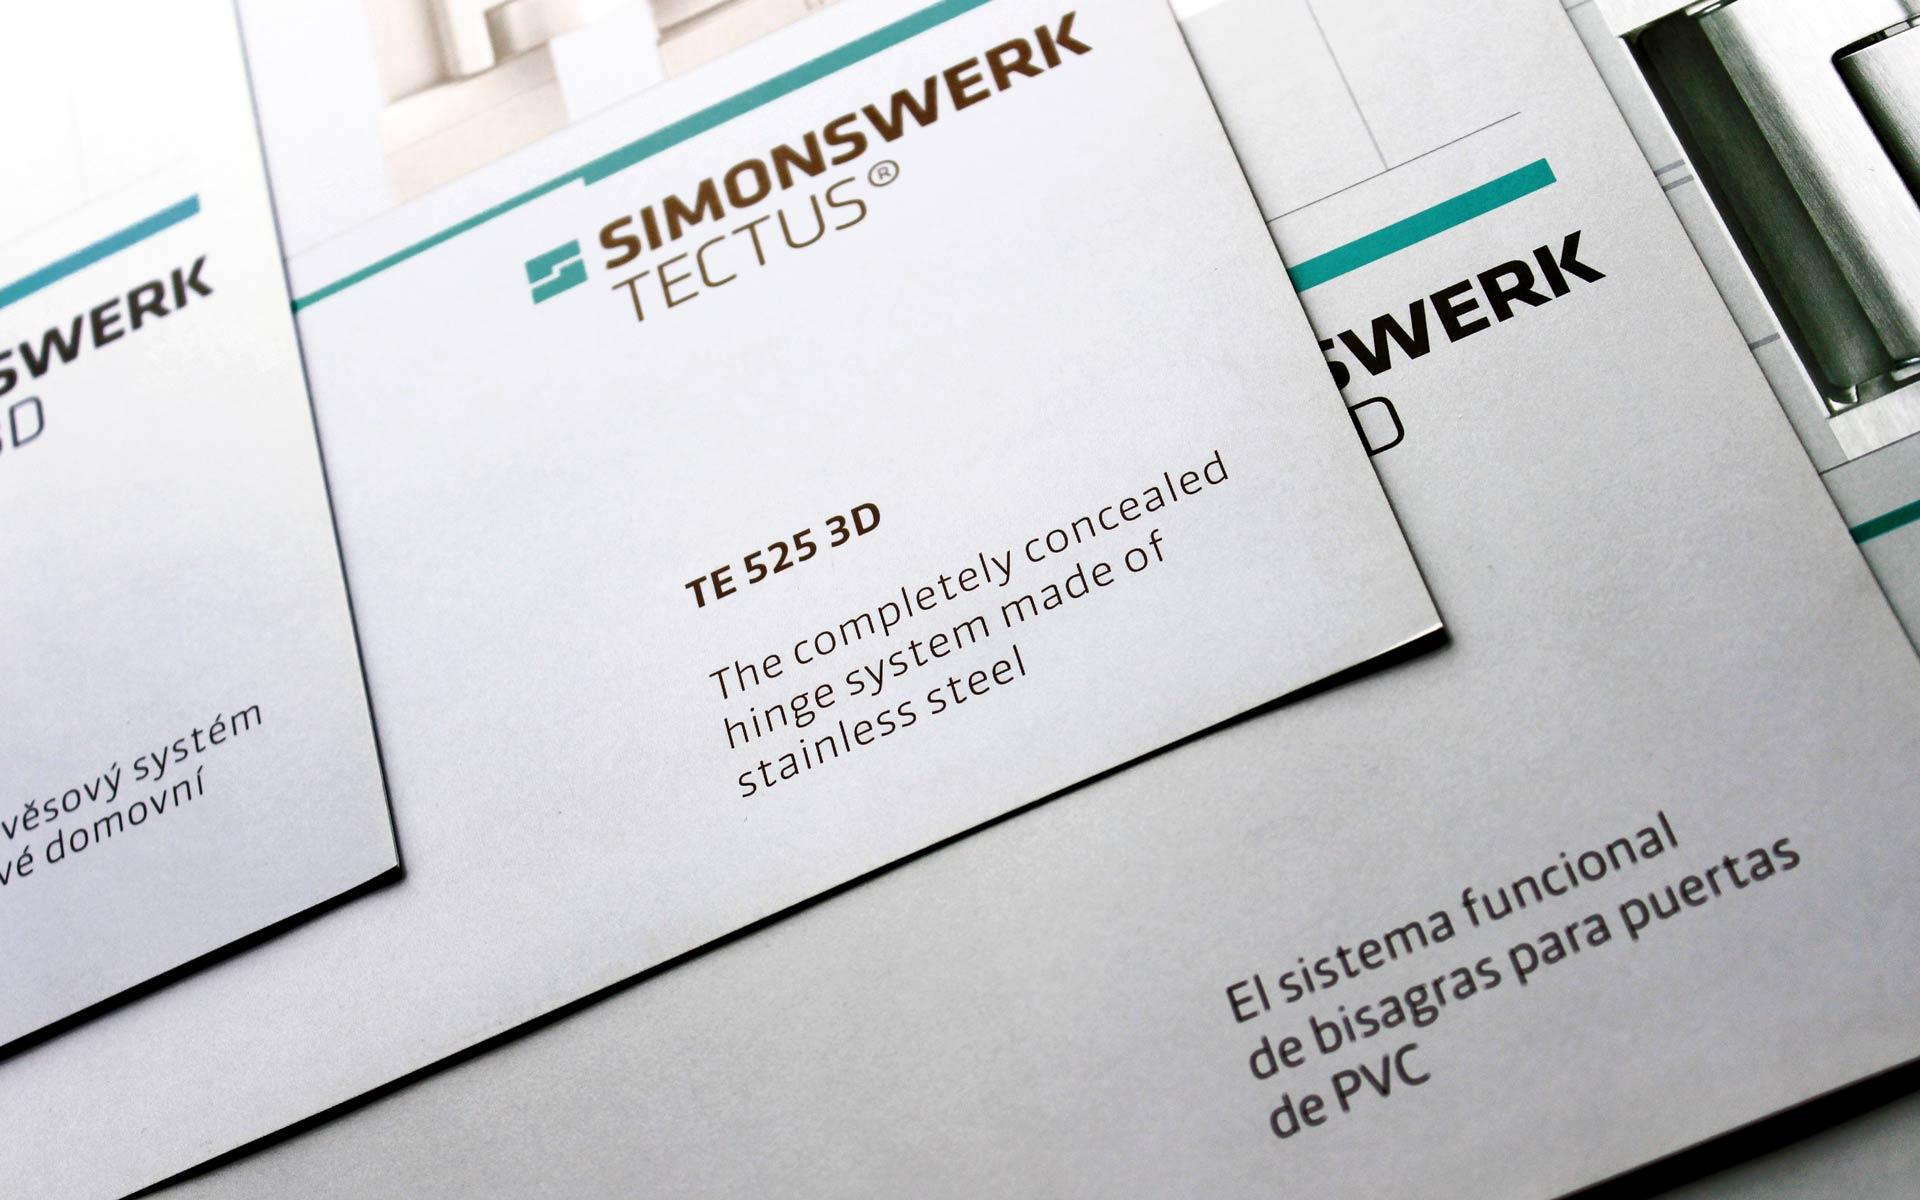 Simonswerk Corporate Design, Broschürentitel